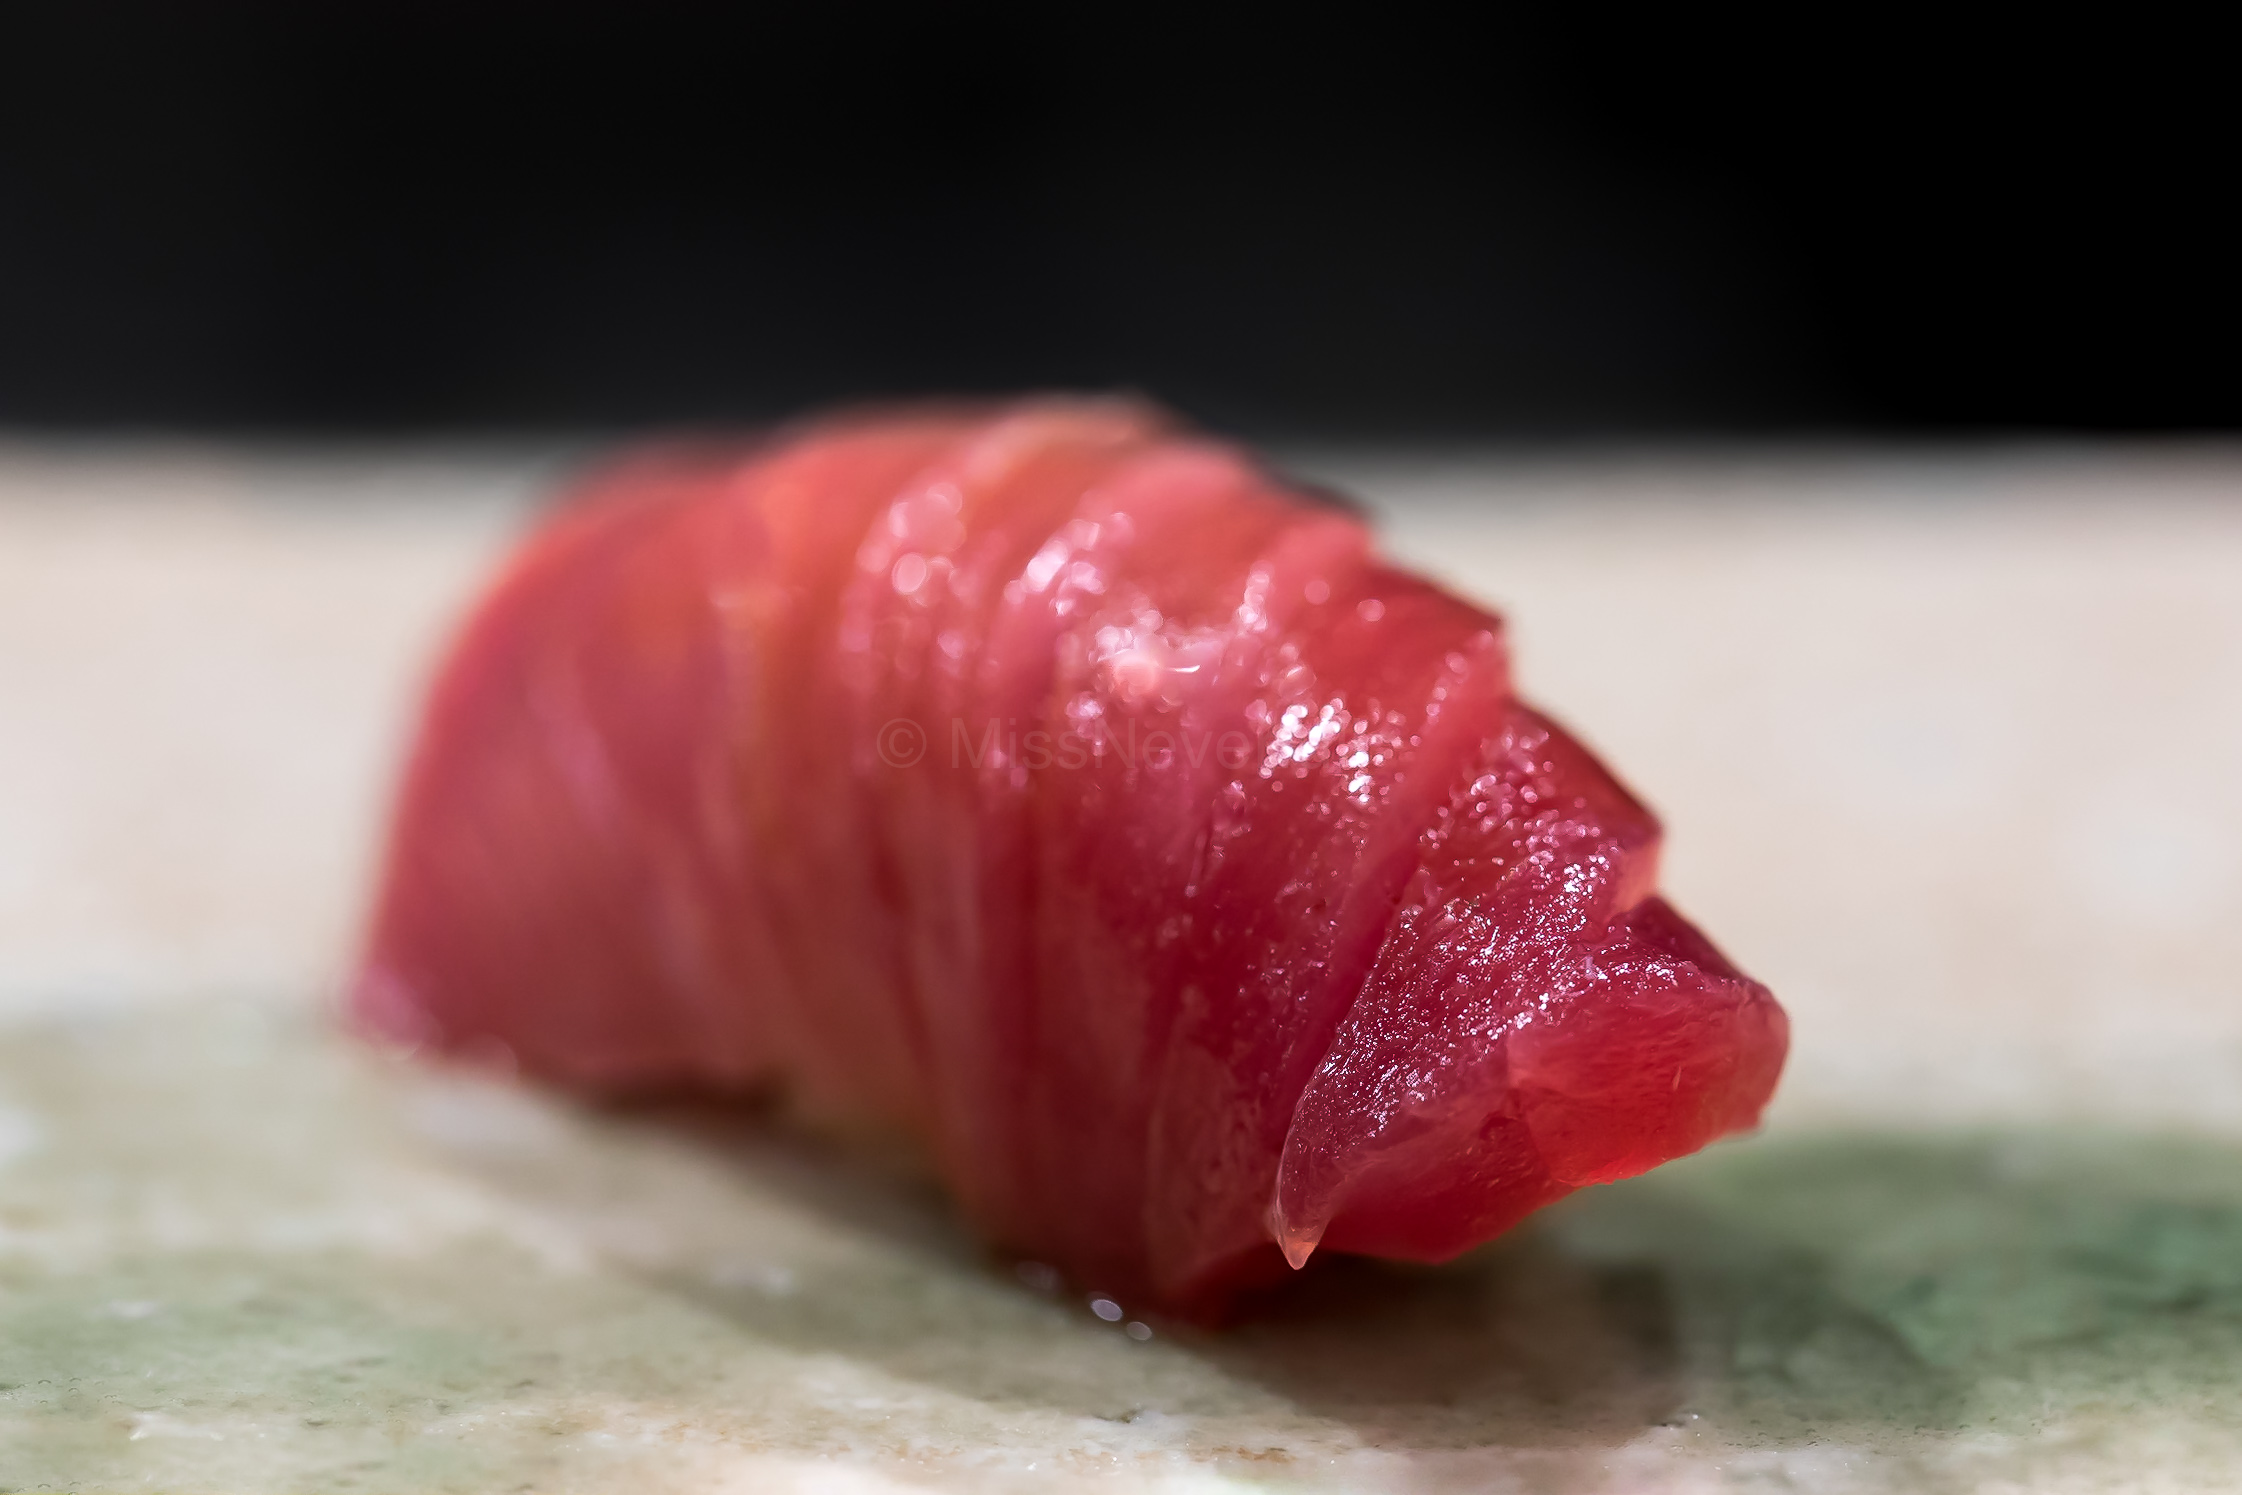 11. Chiaigishi maguro 血合いぎし